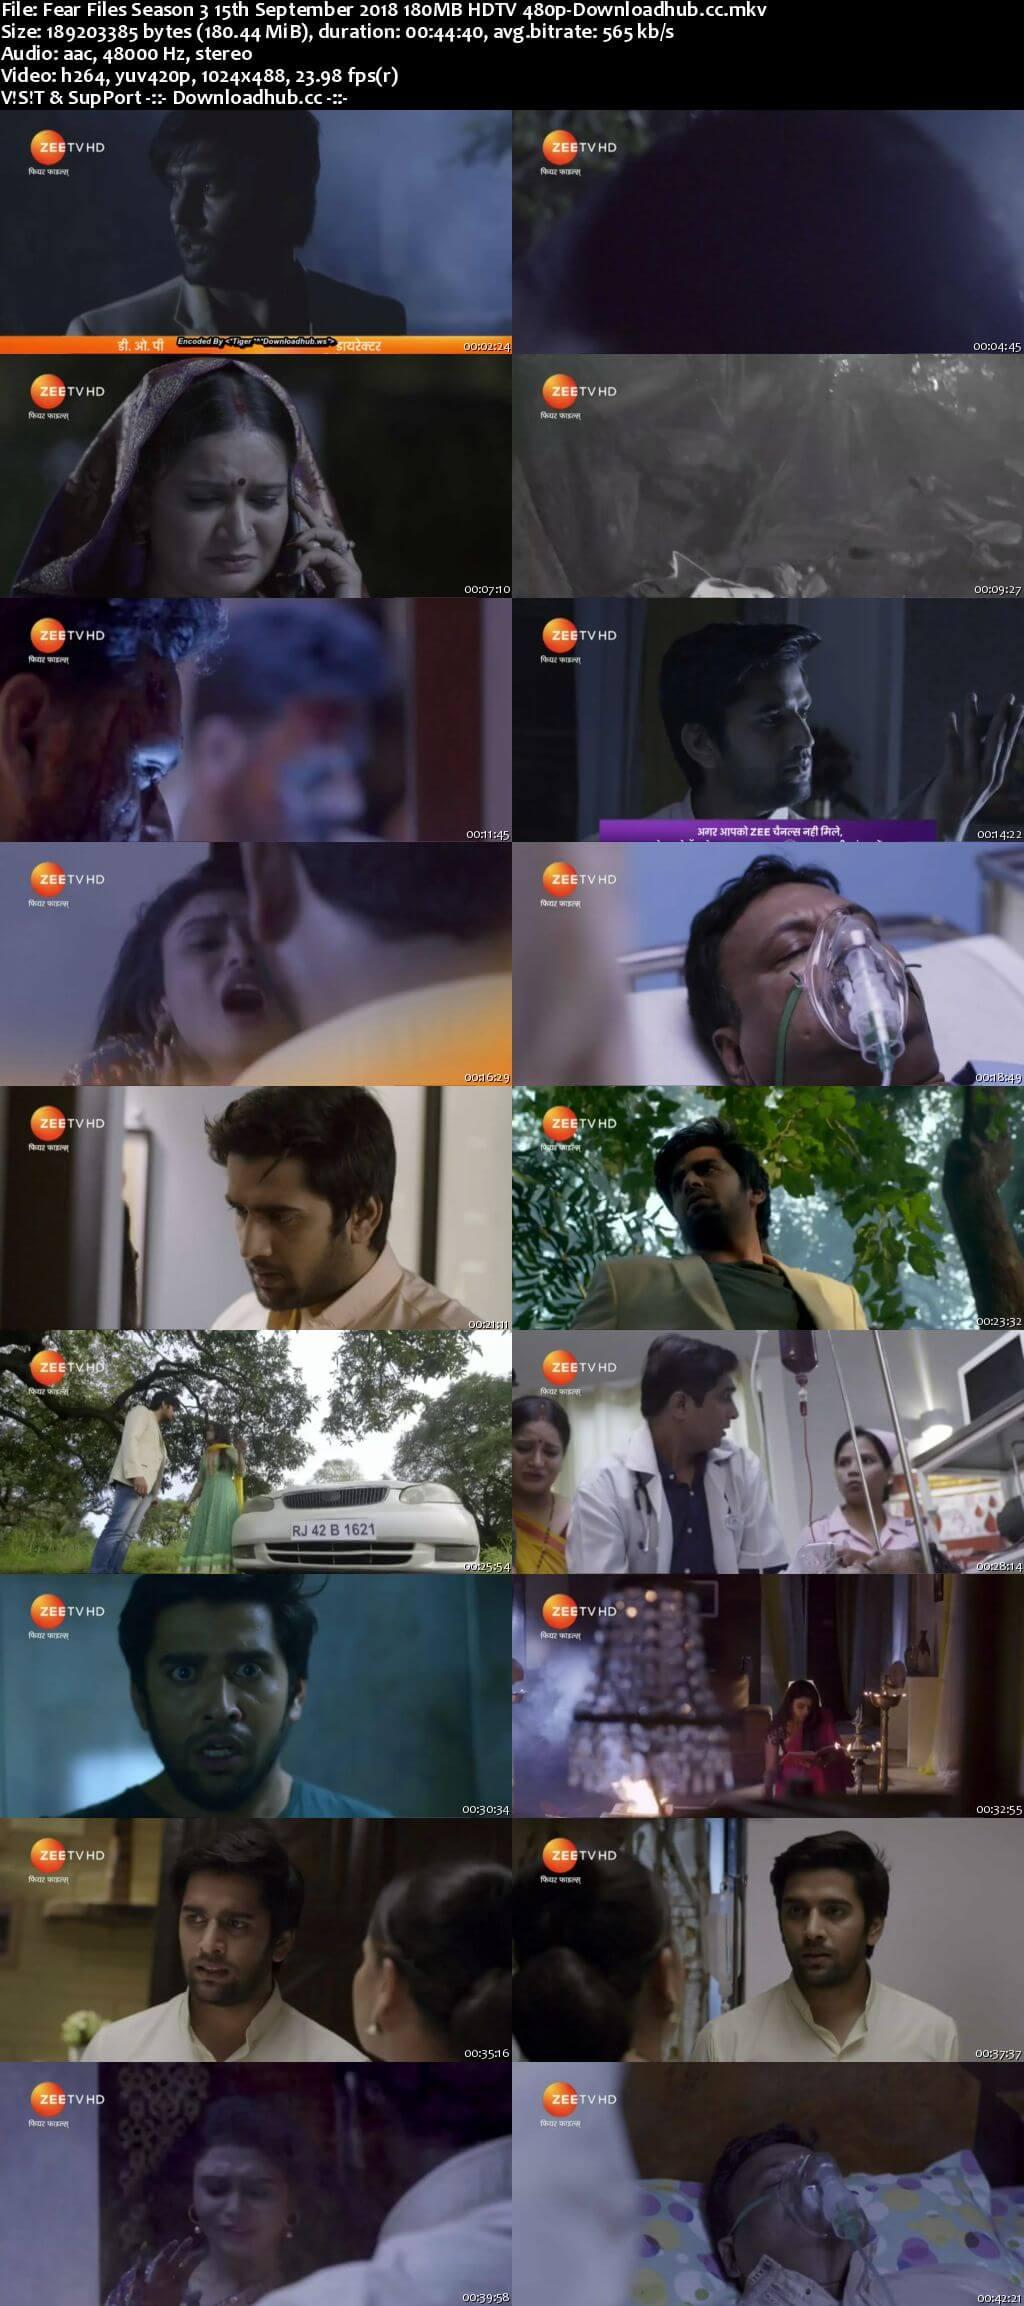 Fear Files Season 3 15th September 2018 180MB HDTV 480p